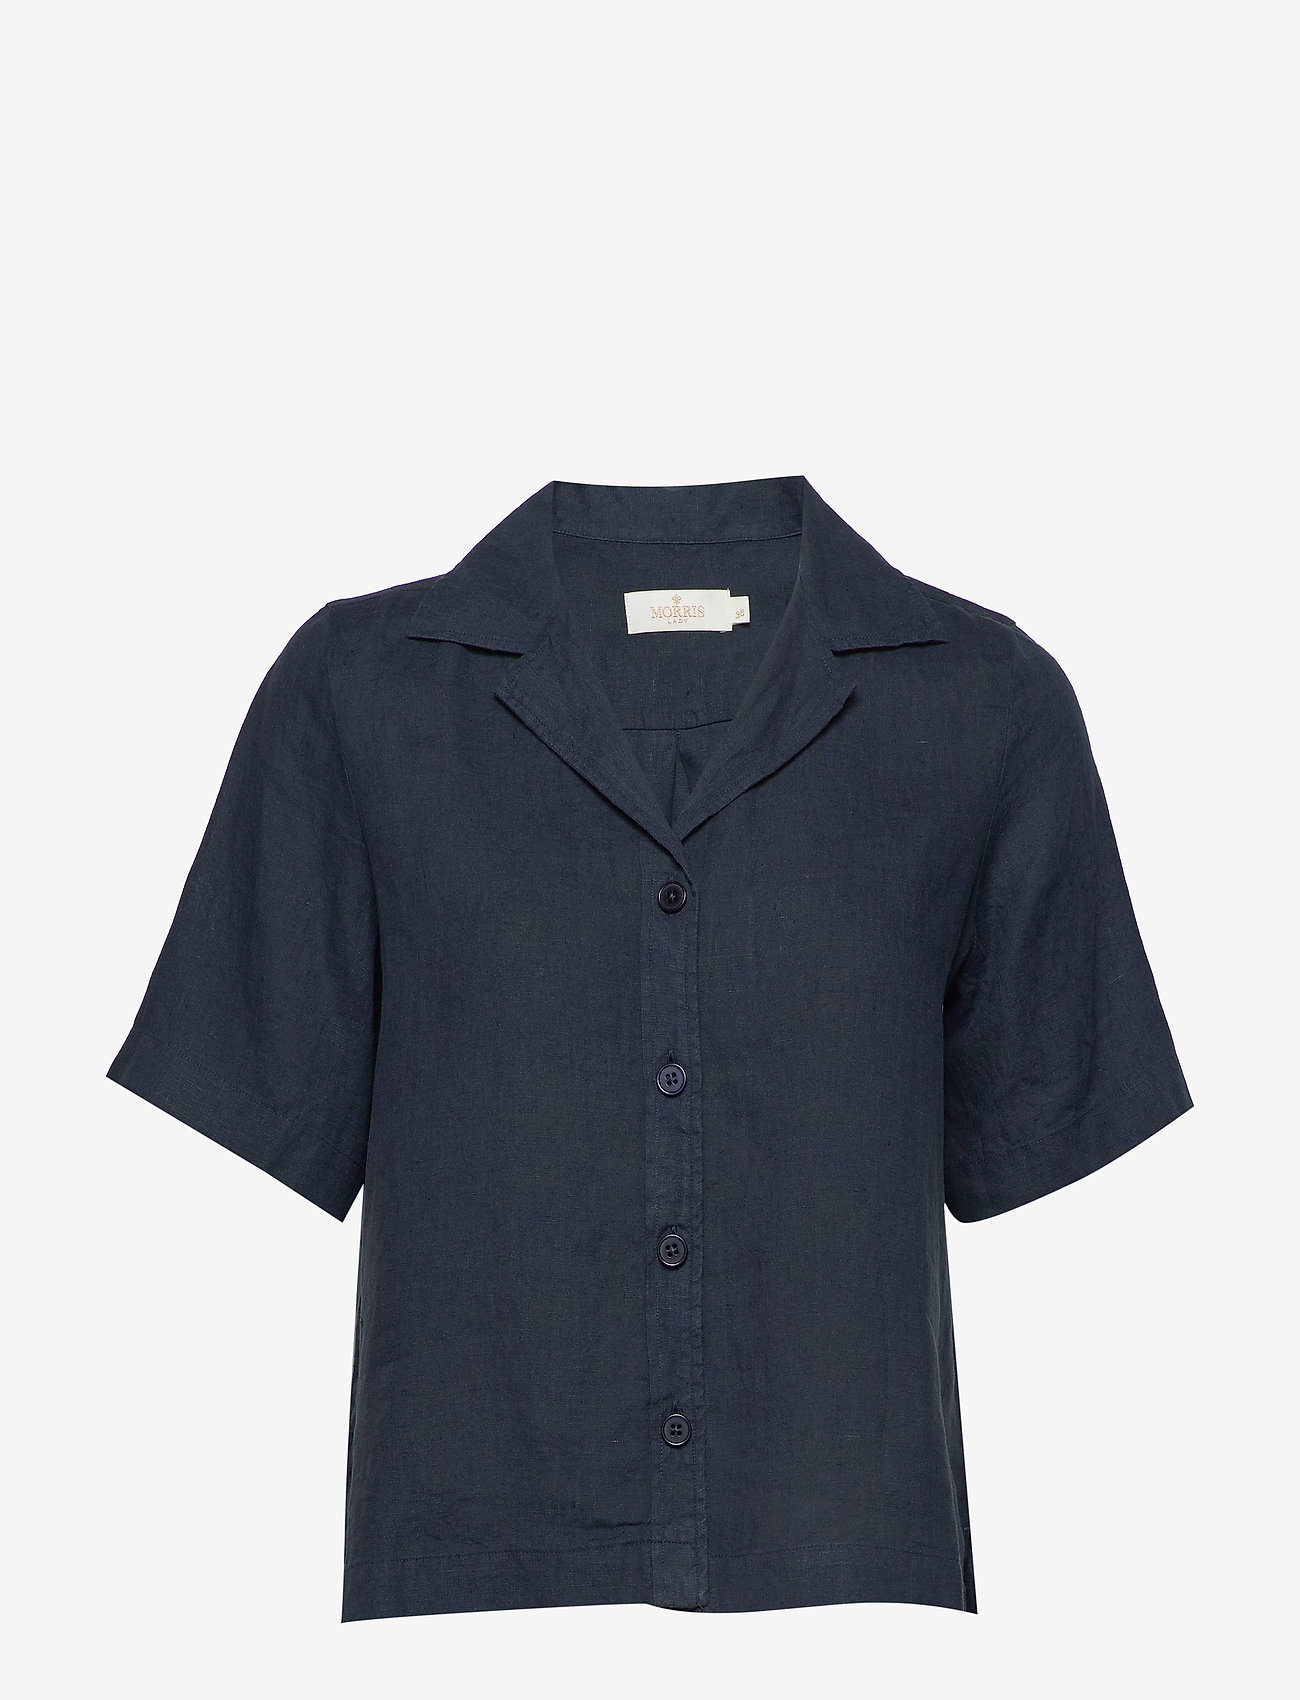 Morris Lady - Donna Linen Shirt - overhemden met korte mouwen - navy - 0